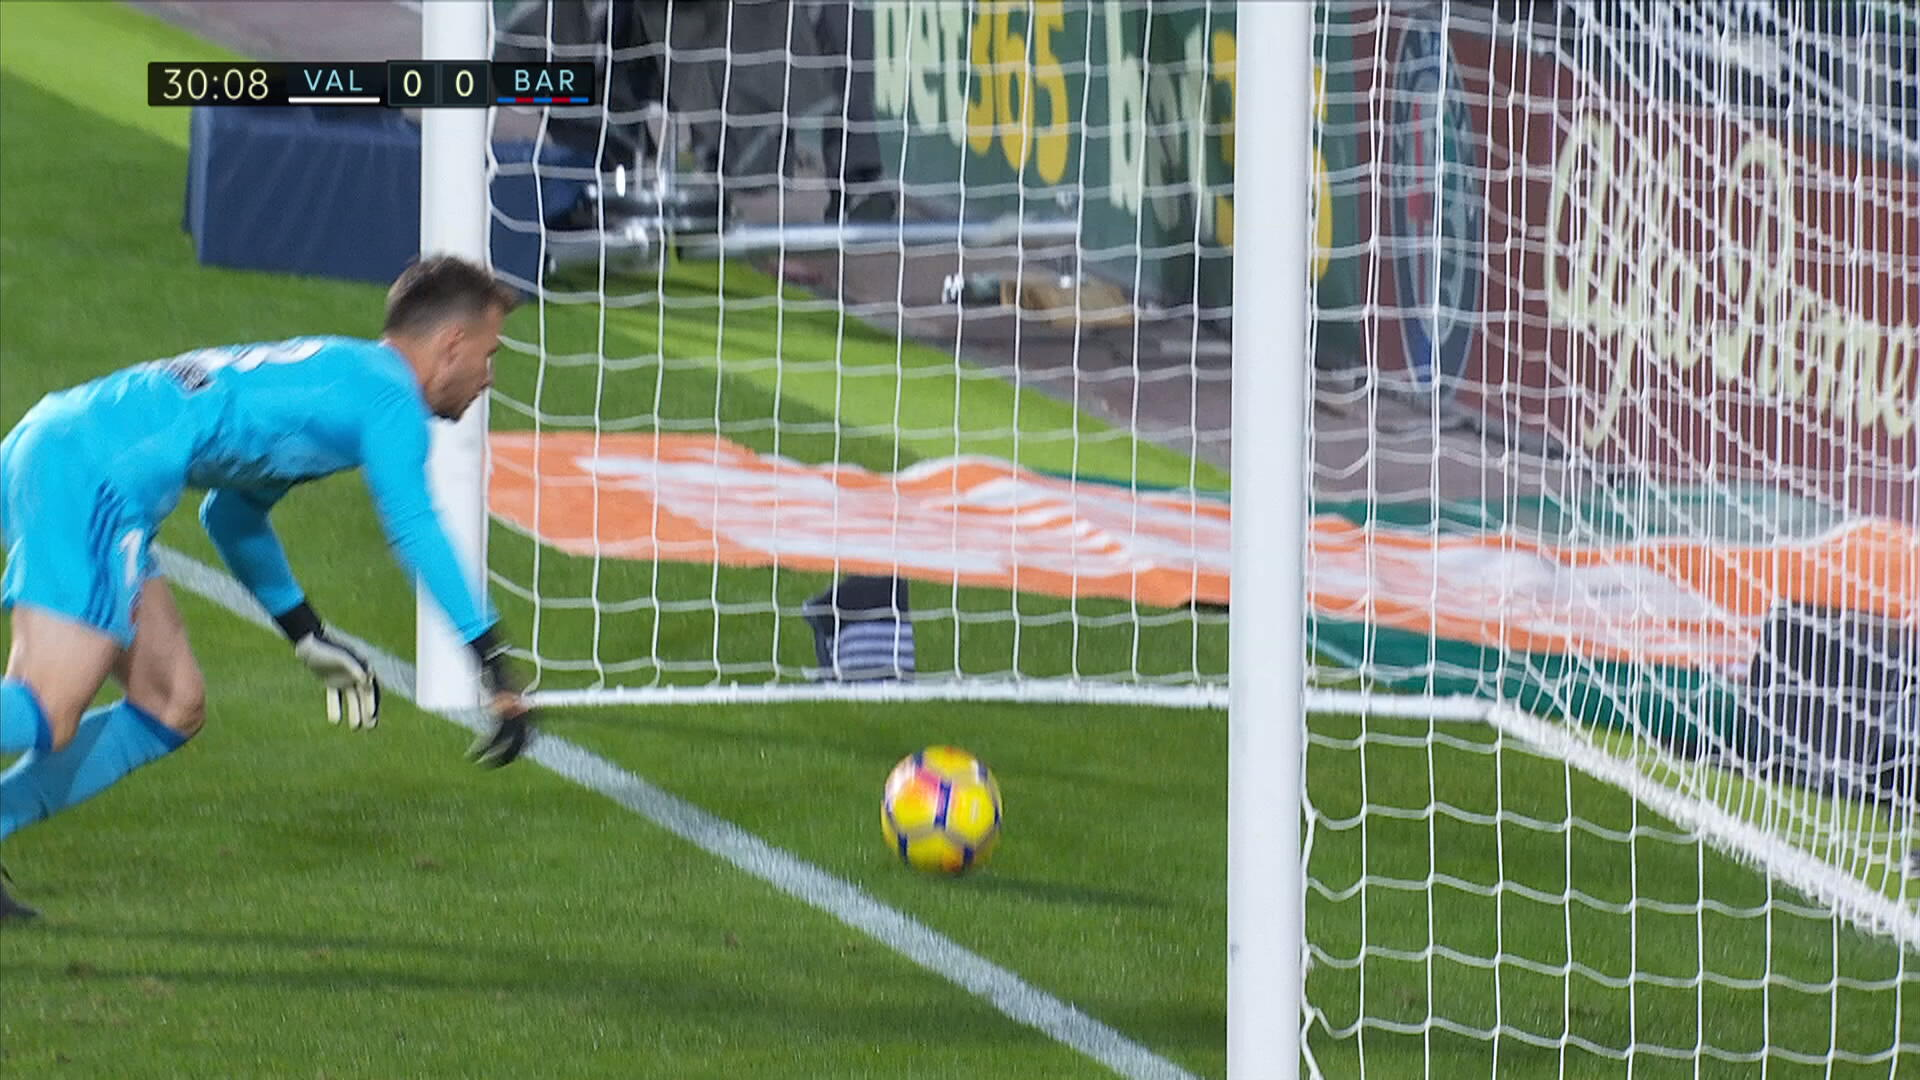 Valencia players accept Messi goal legit: Refs make mistakes